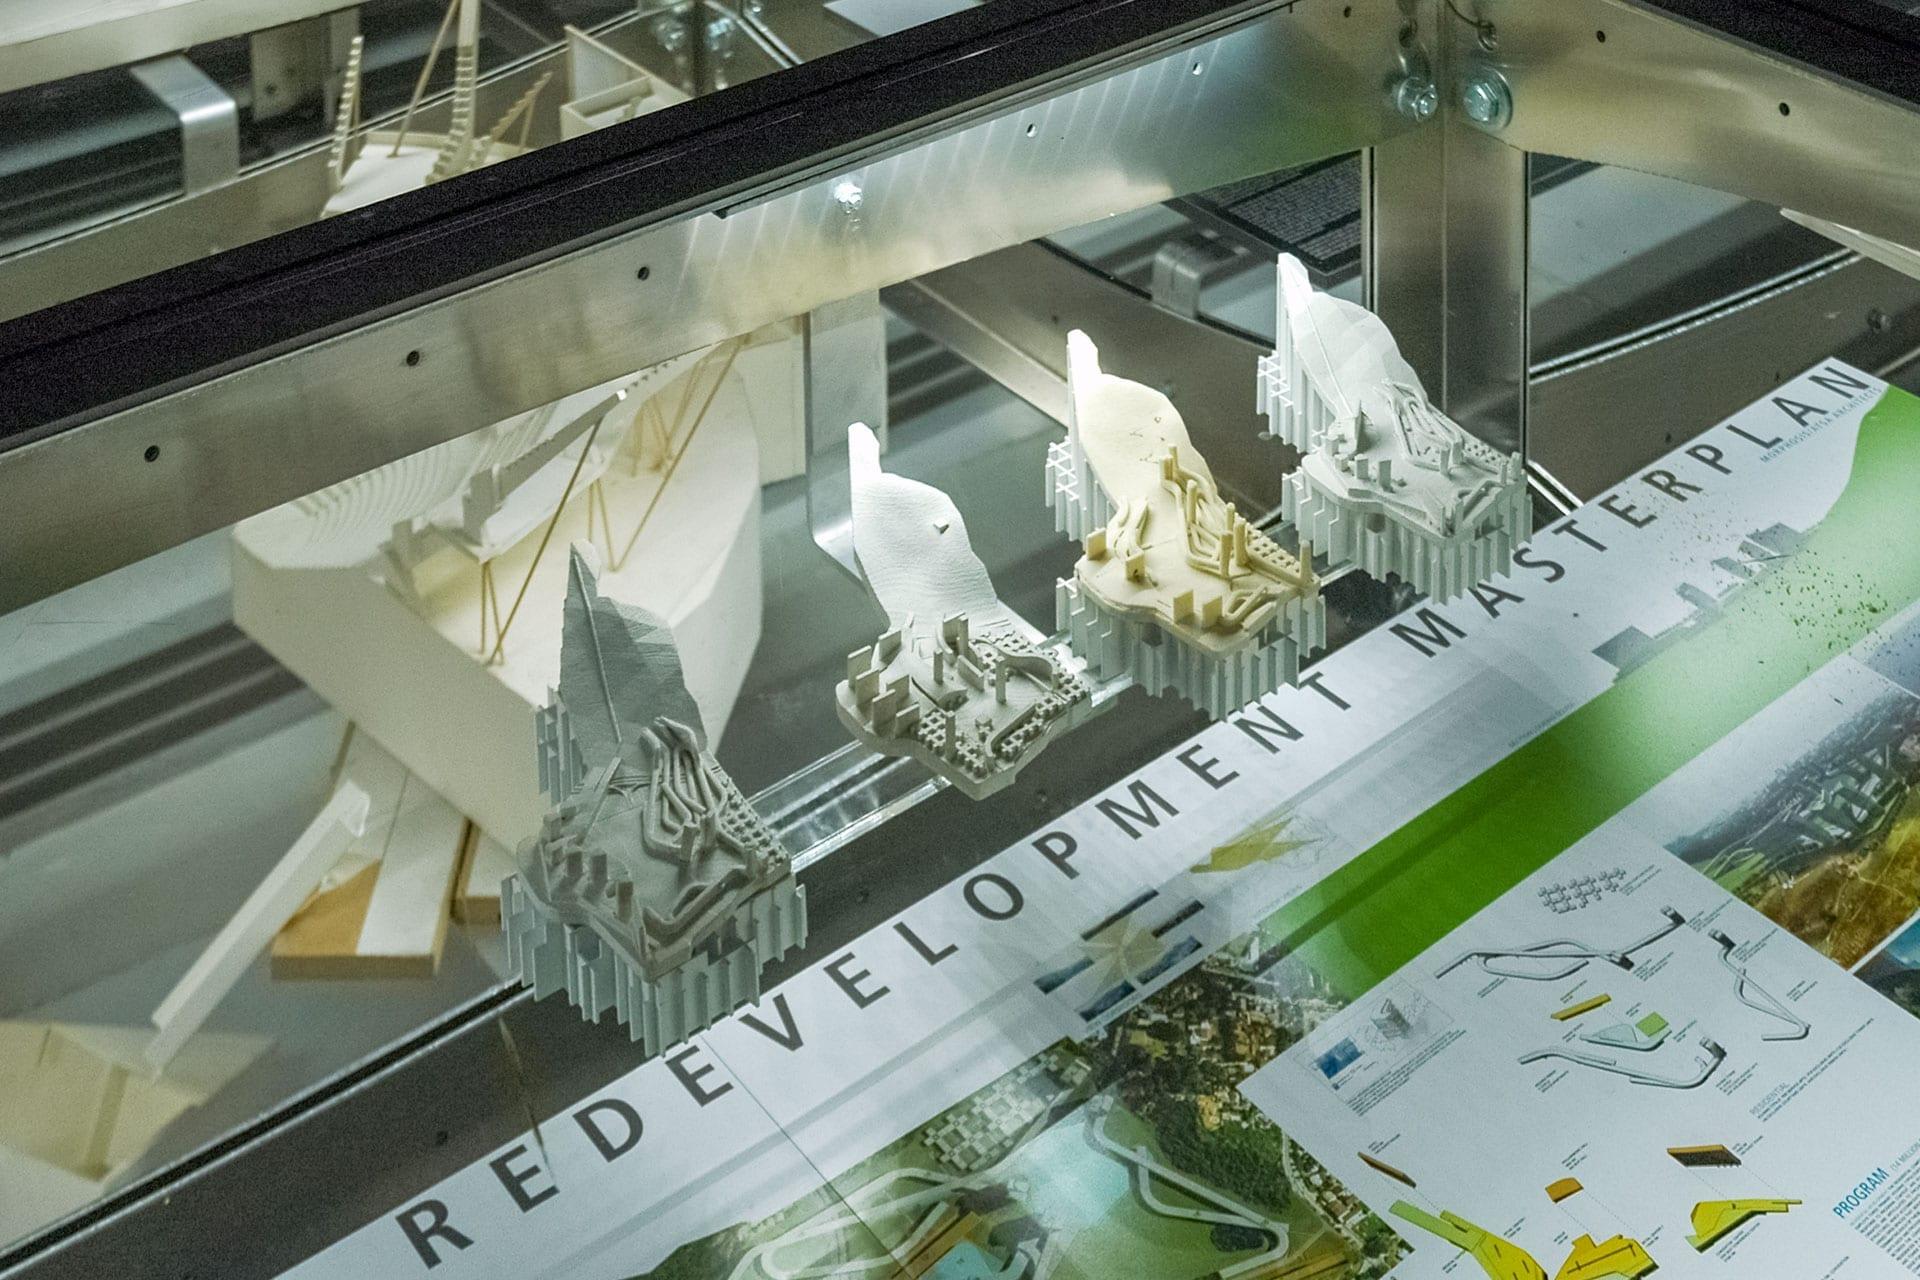 Various exhibit materials displayed underneath the raised floor.